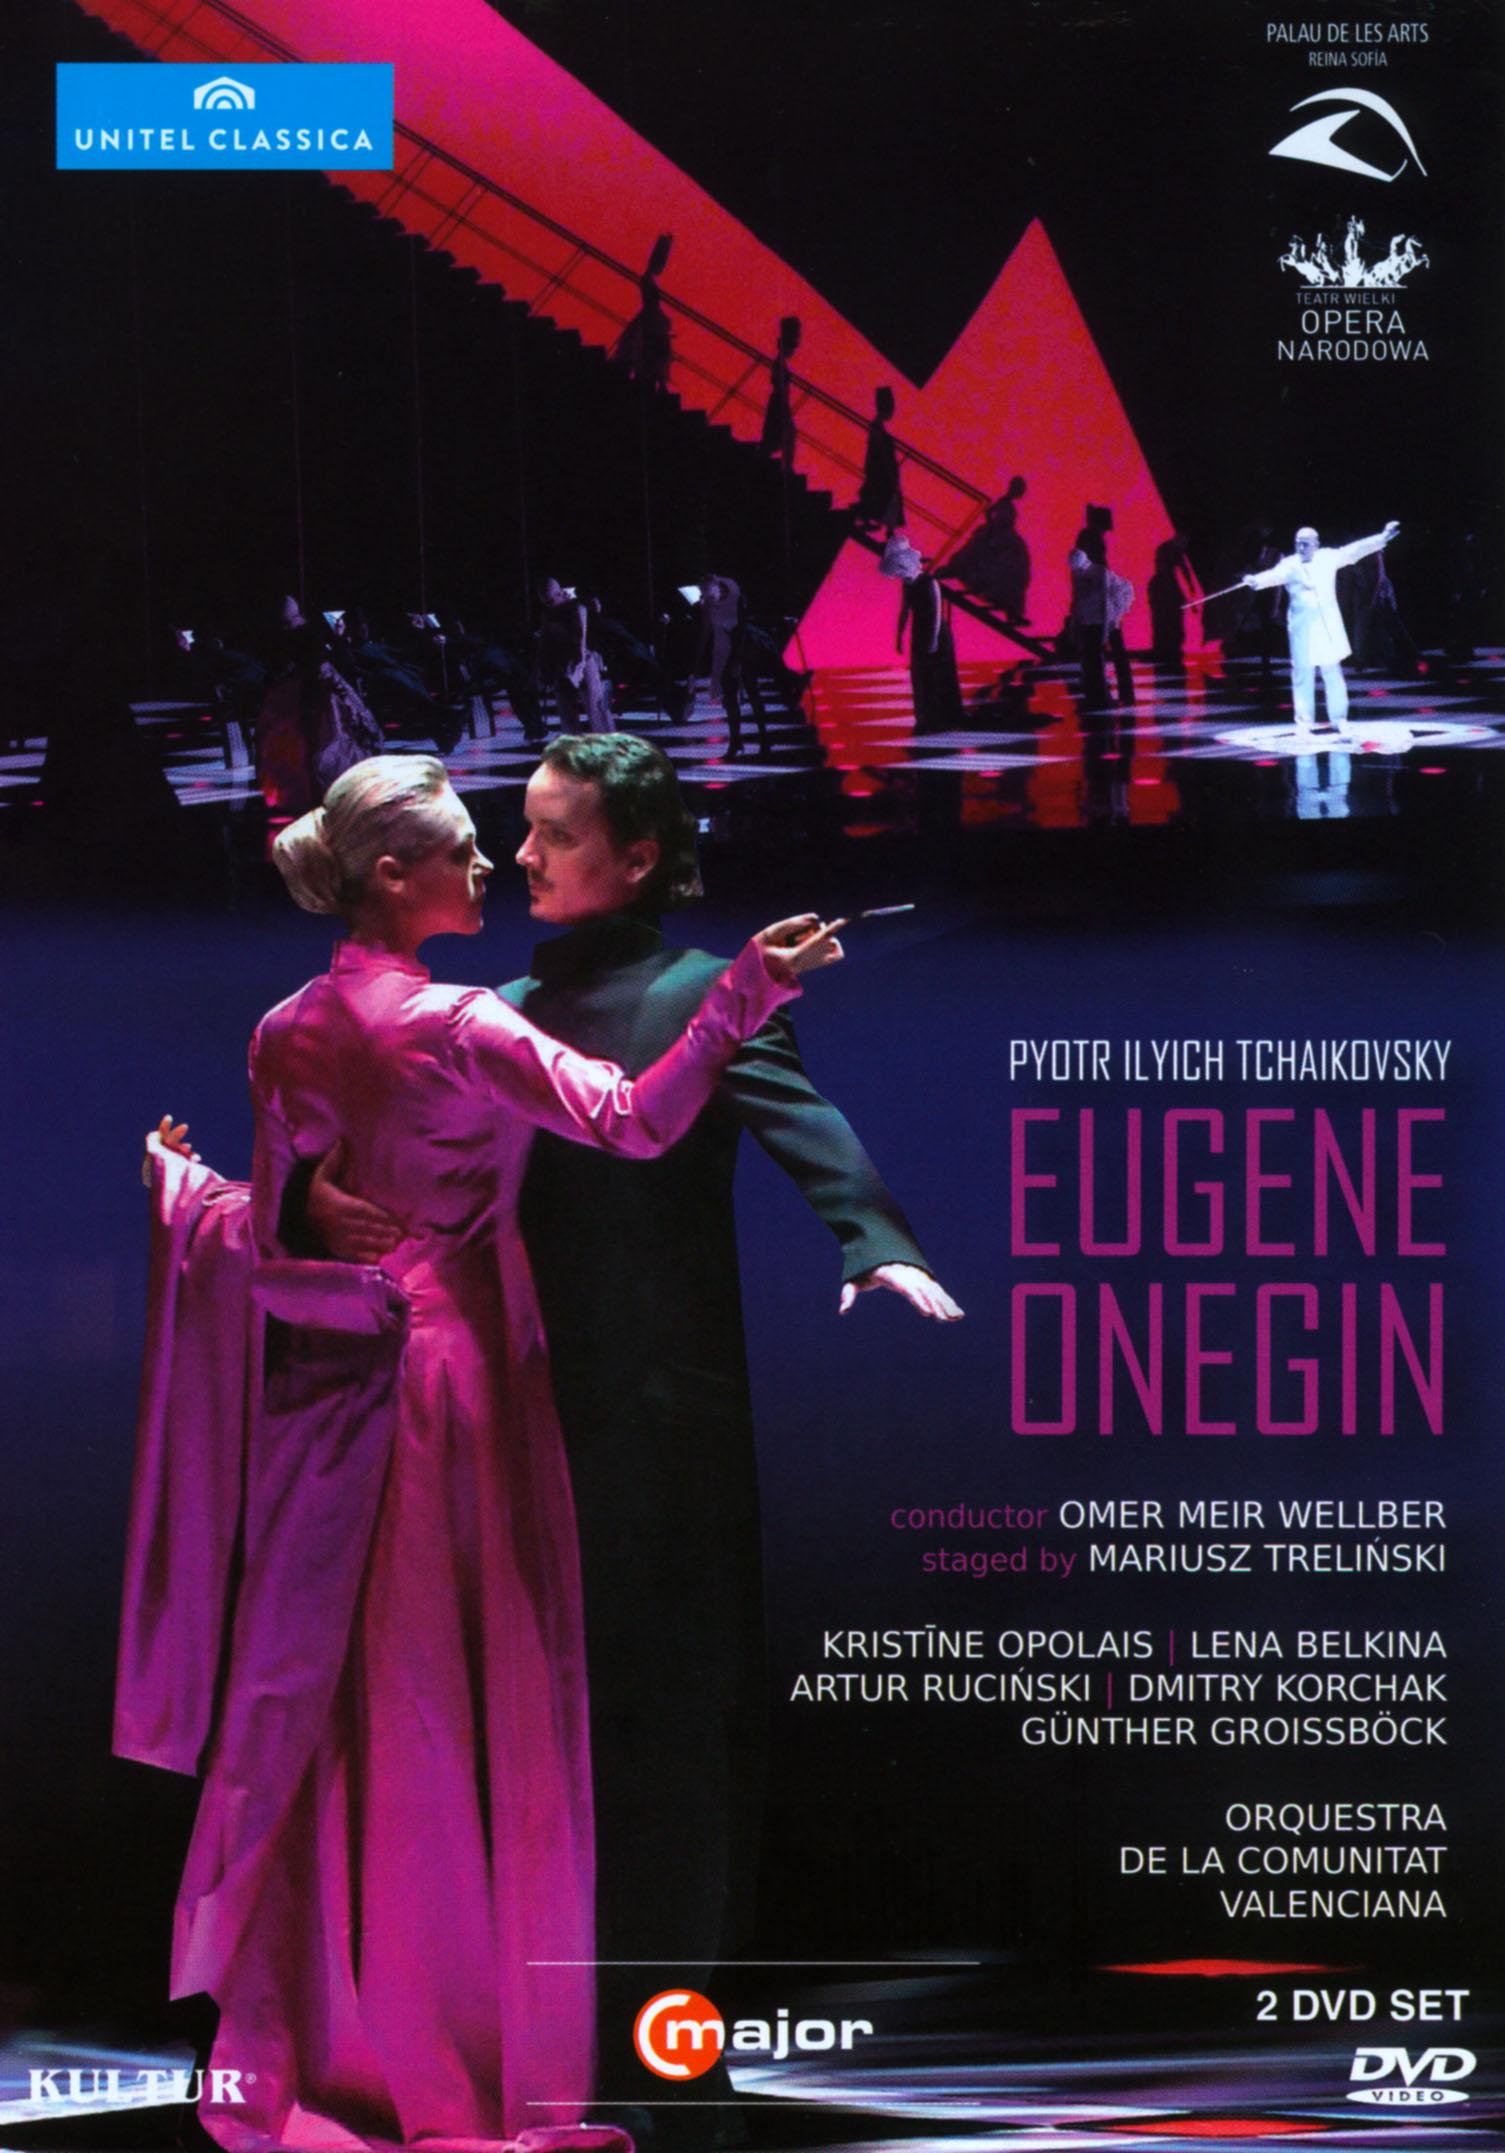 Eugene Onegin (Opera Narodowa)